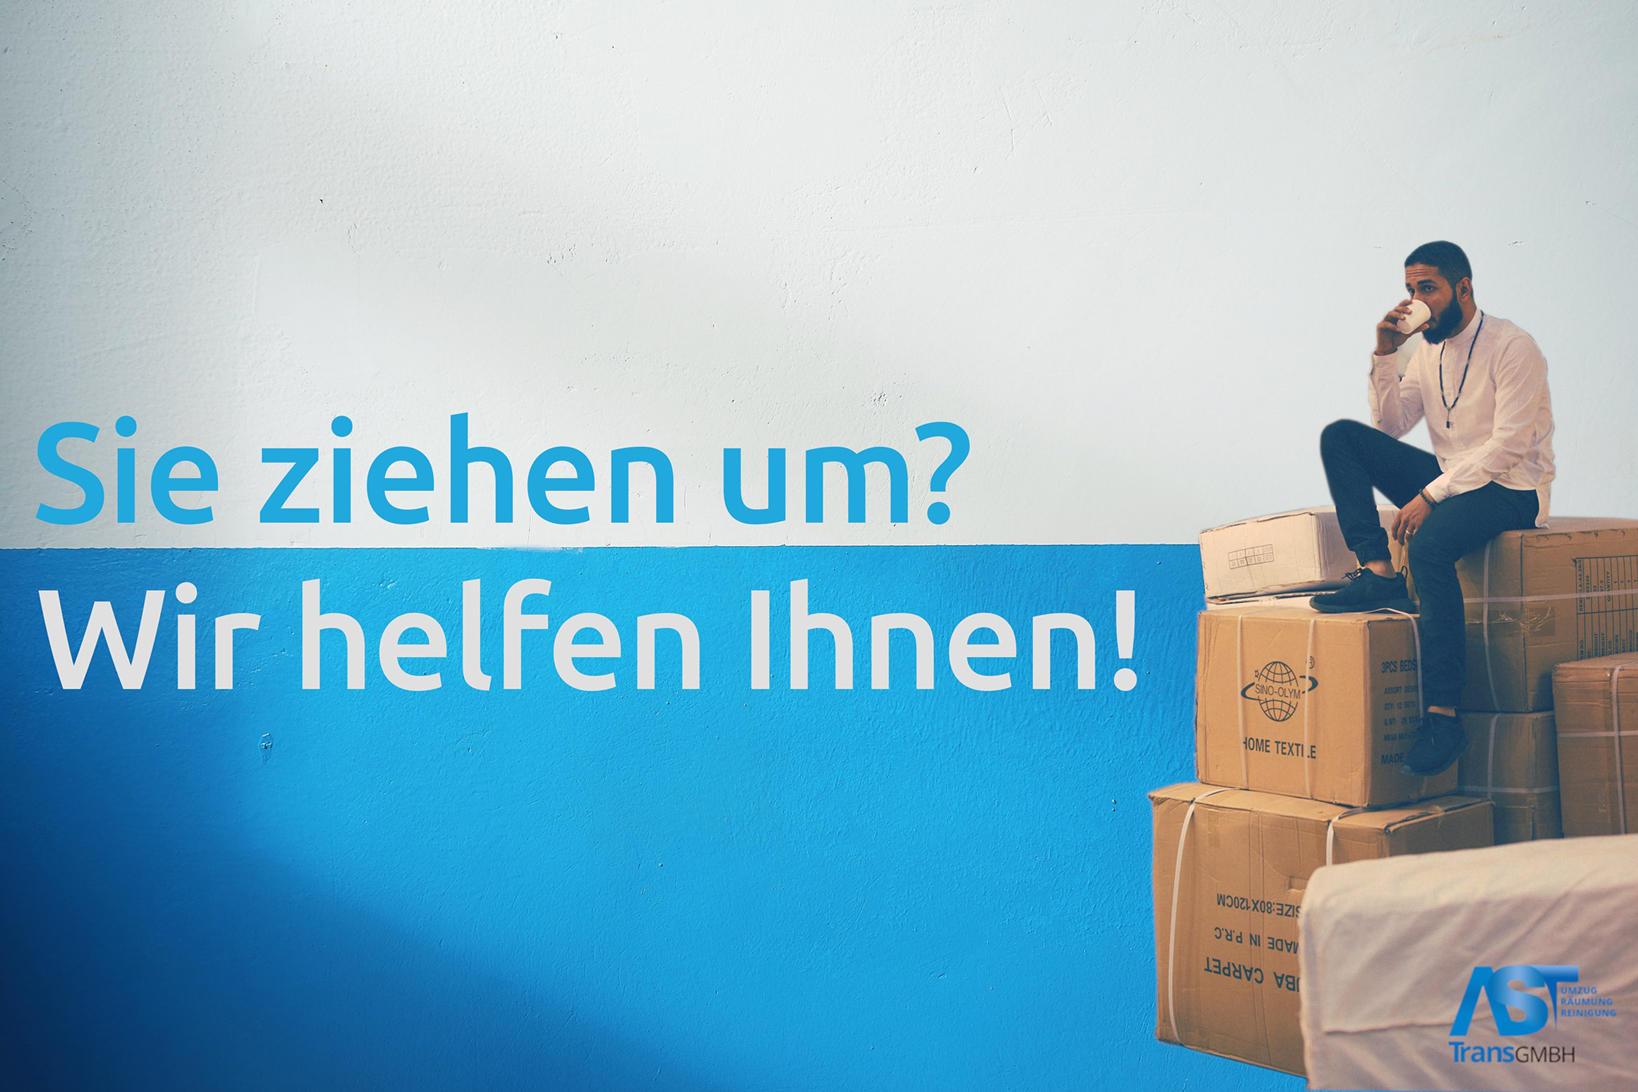 Ast-Trans GmbH